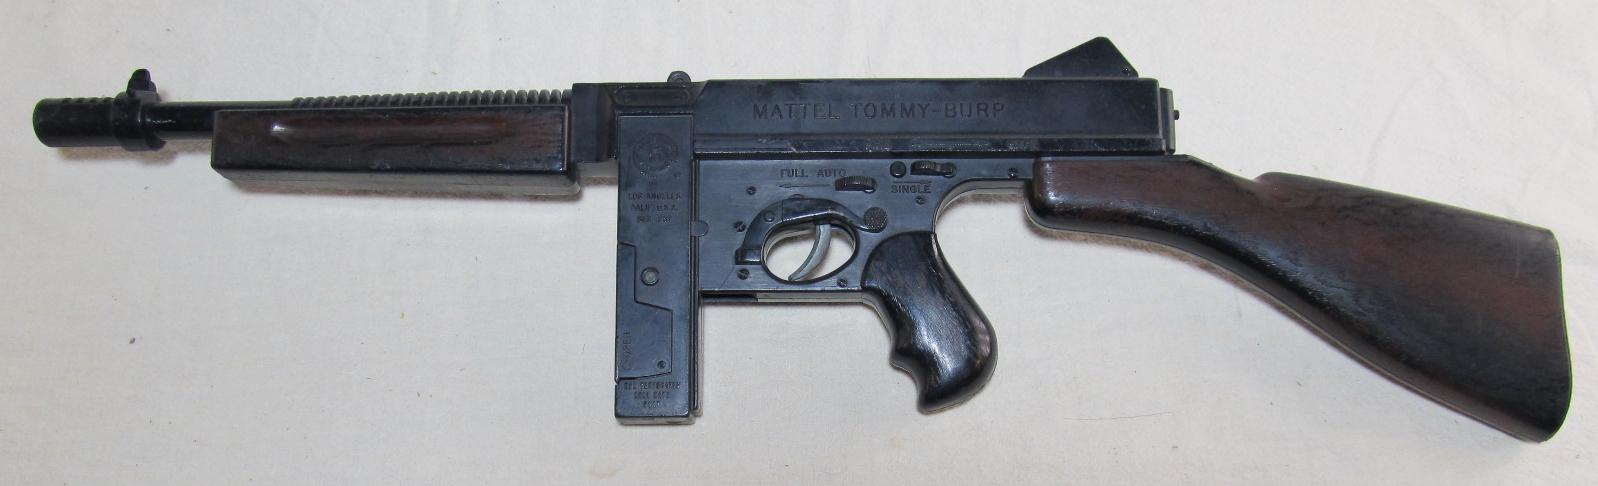 mattel tommy burp gun 2